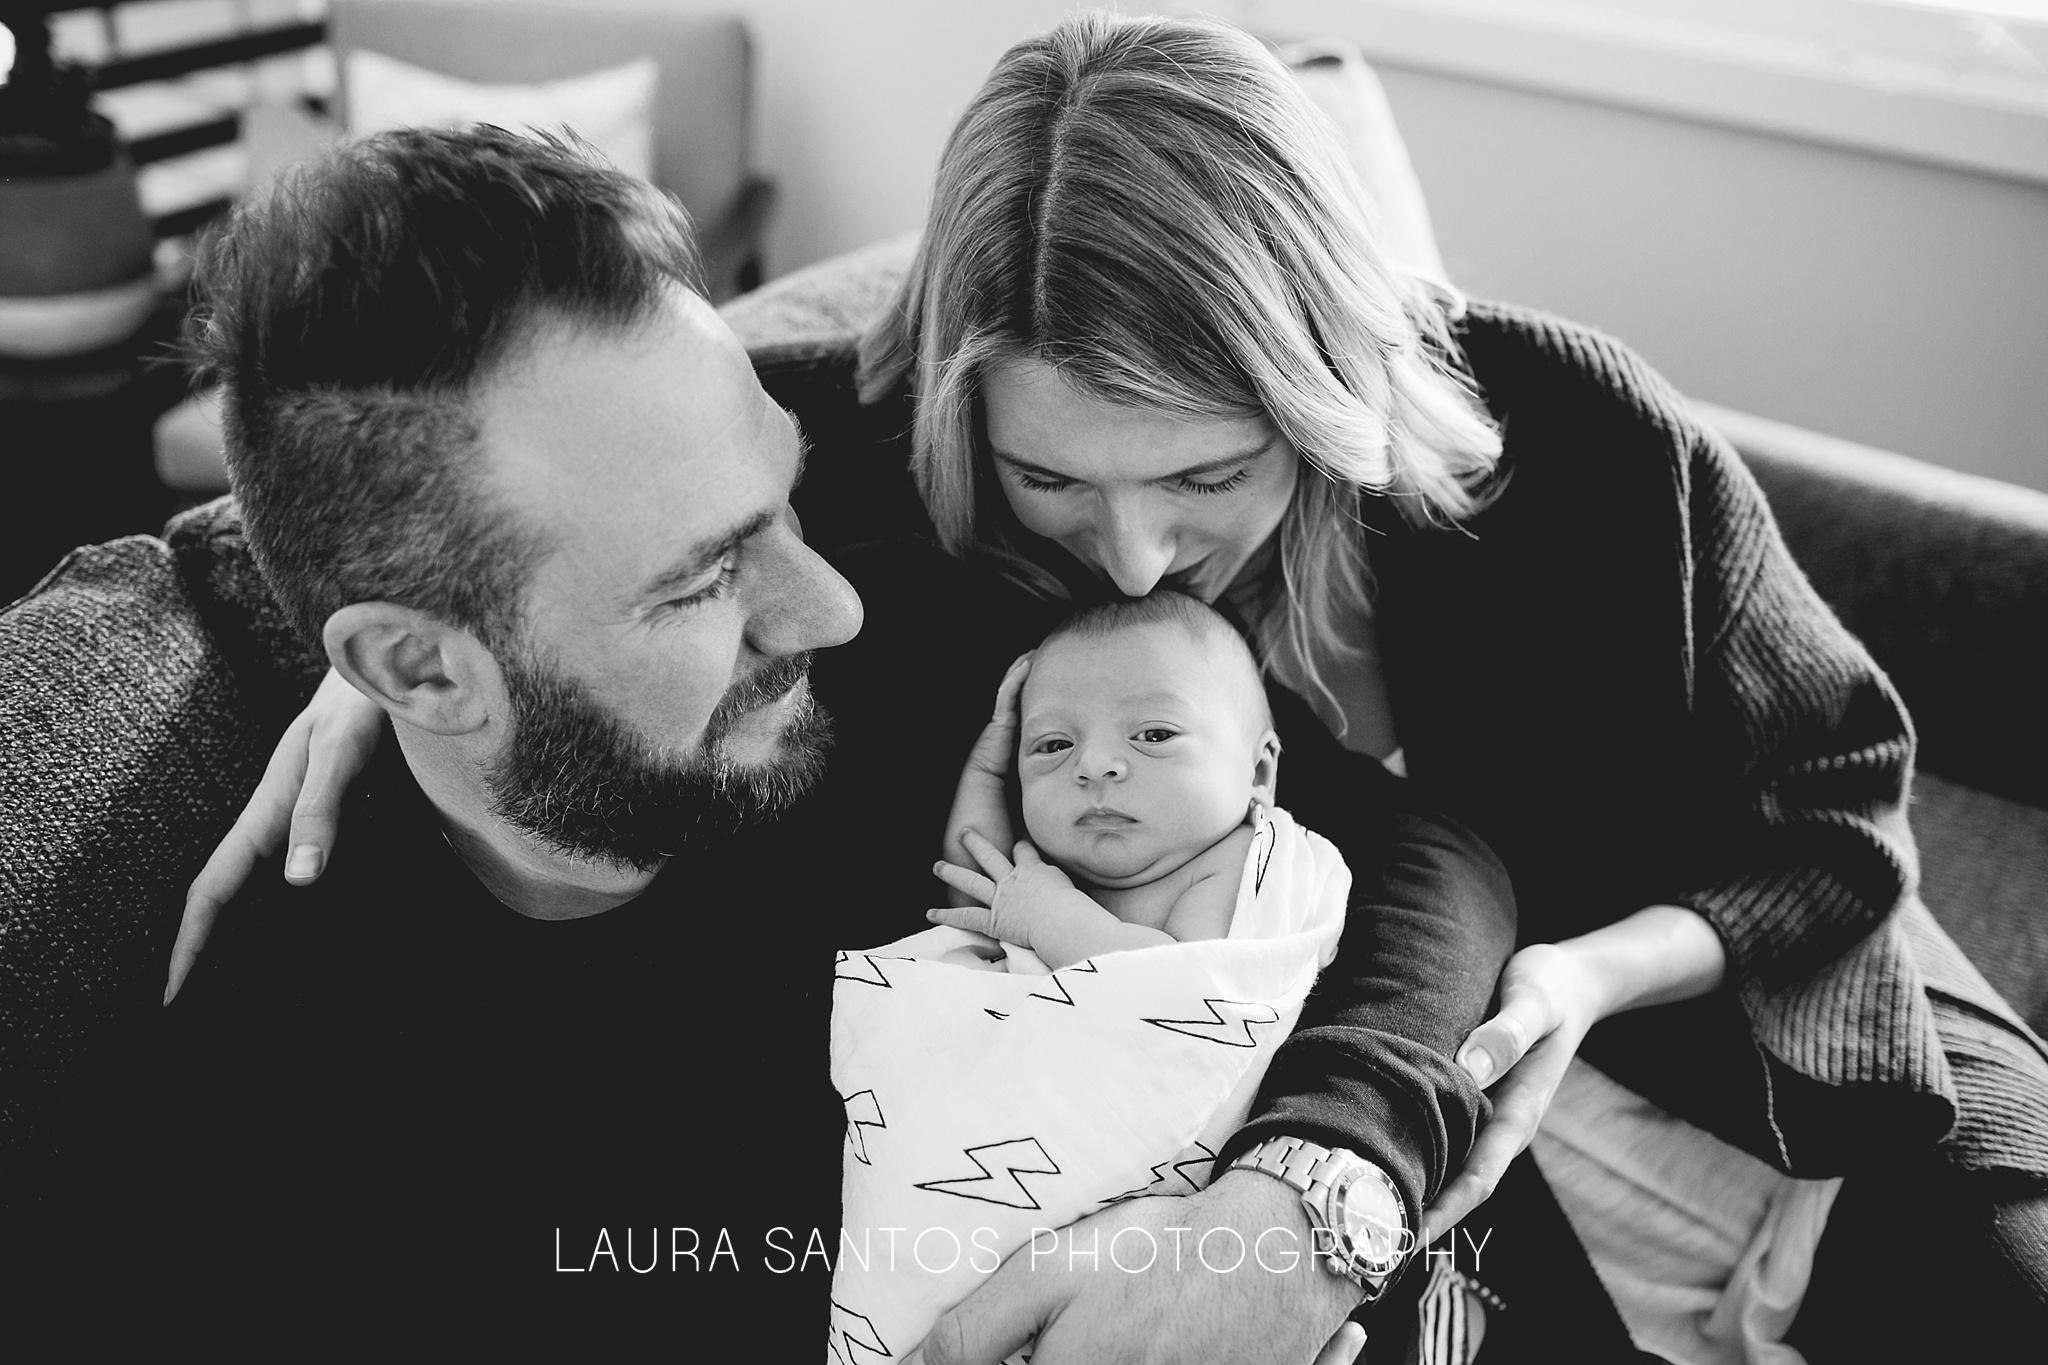 Laura Santos Photography Portland Oregon Family Photographer_0178.jpg